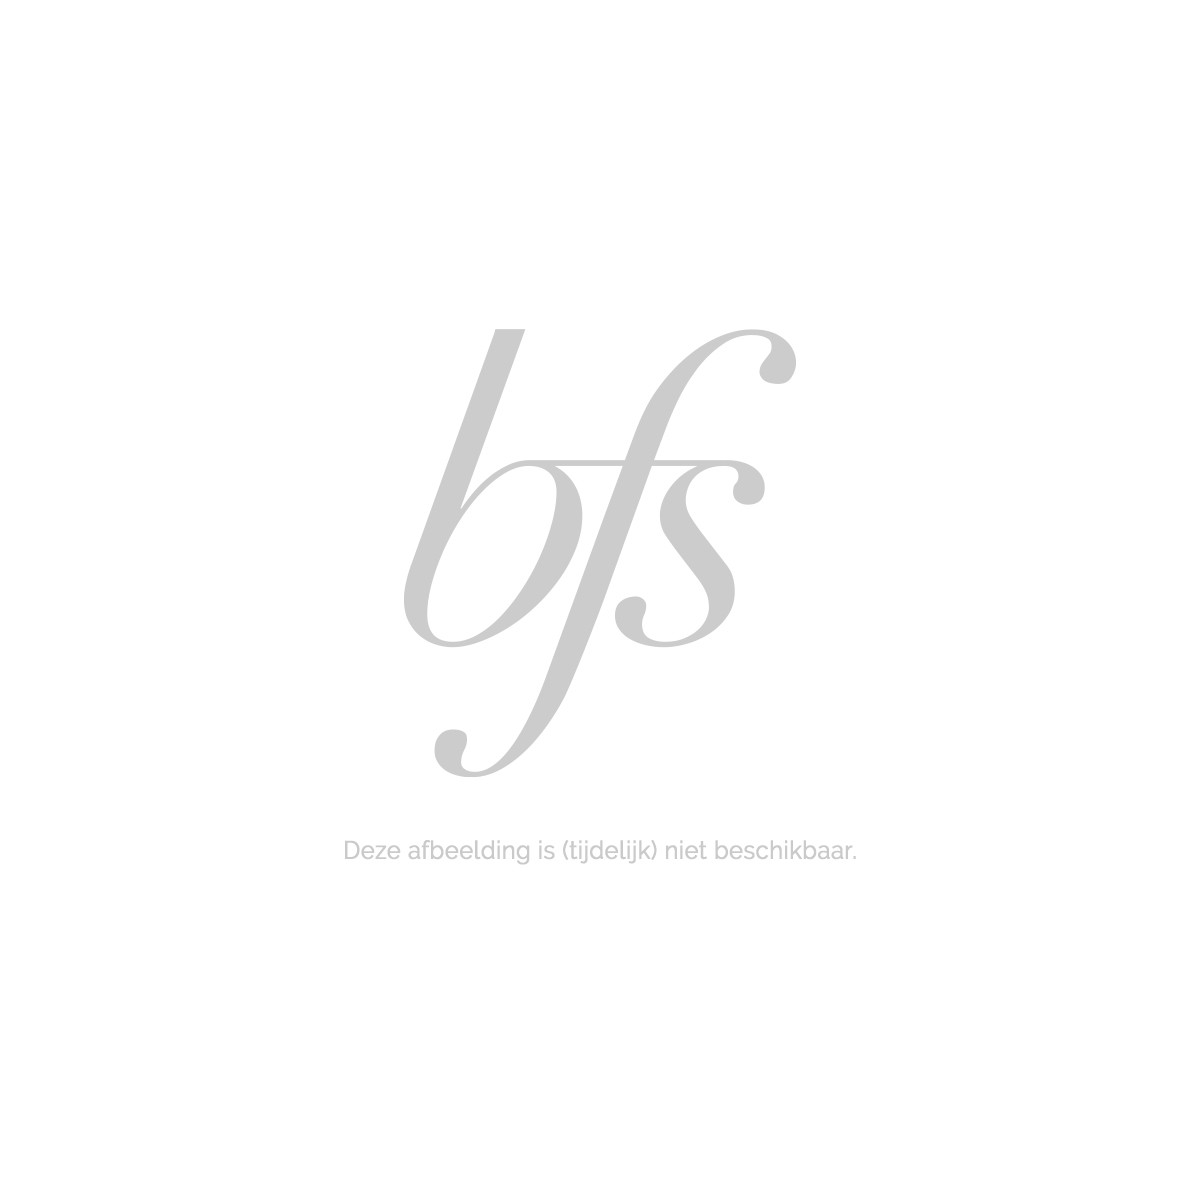 Chanel Le Volume Revolution De Chanel Mascara #10 Noir 6 Gr